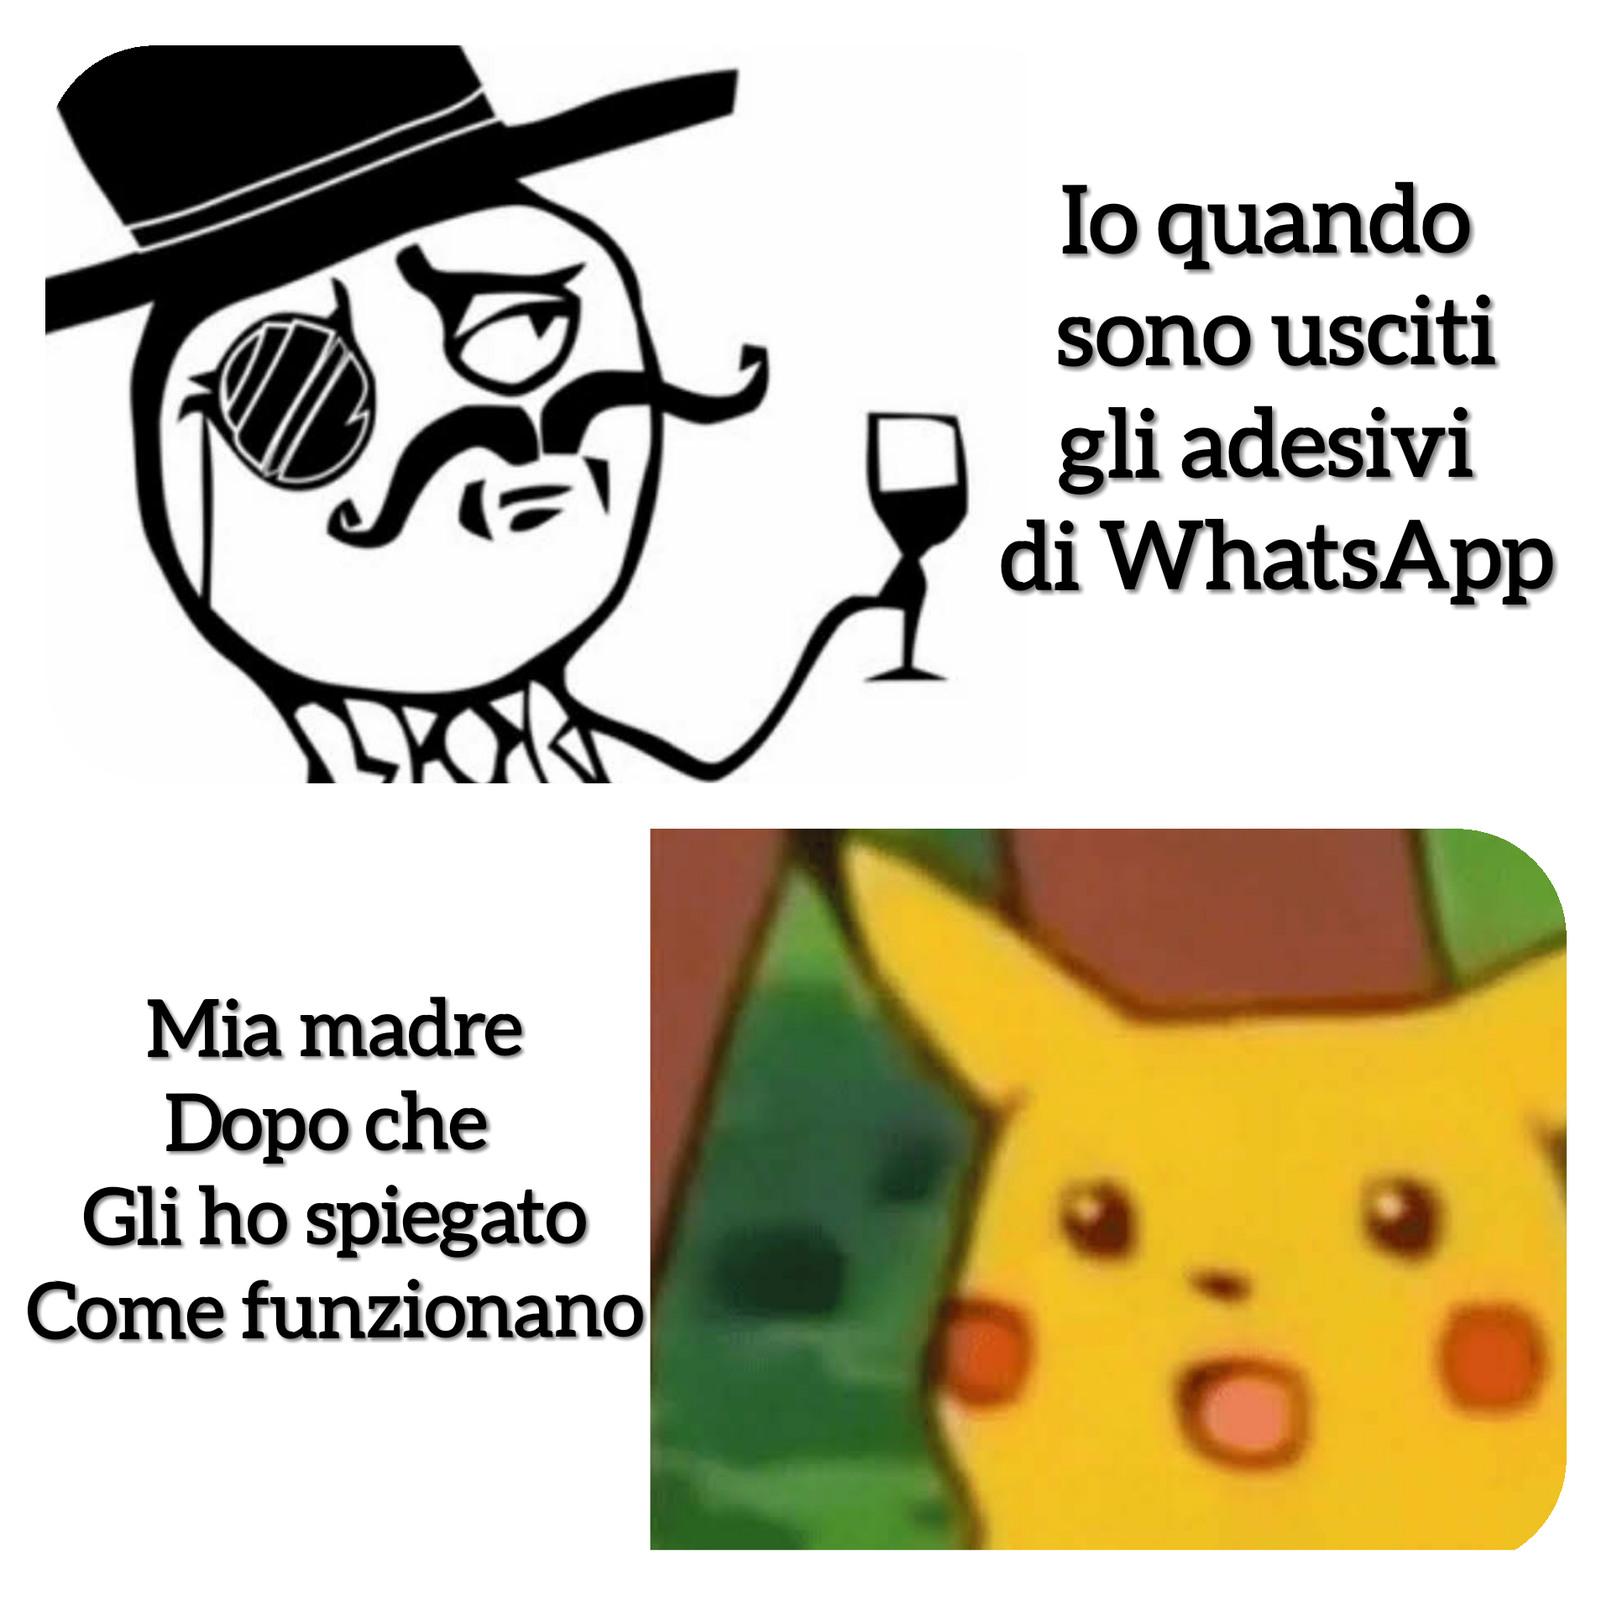 I nuovi stikers di WhatsApp - meme